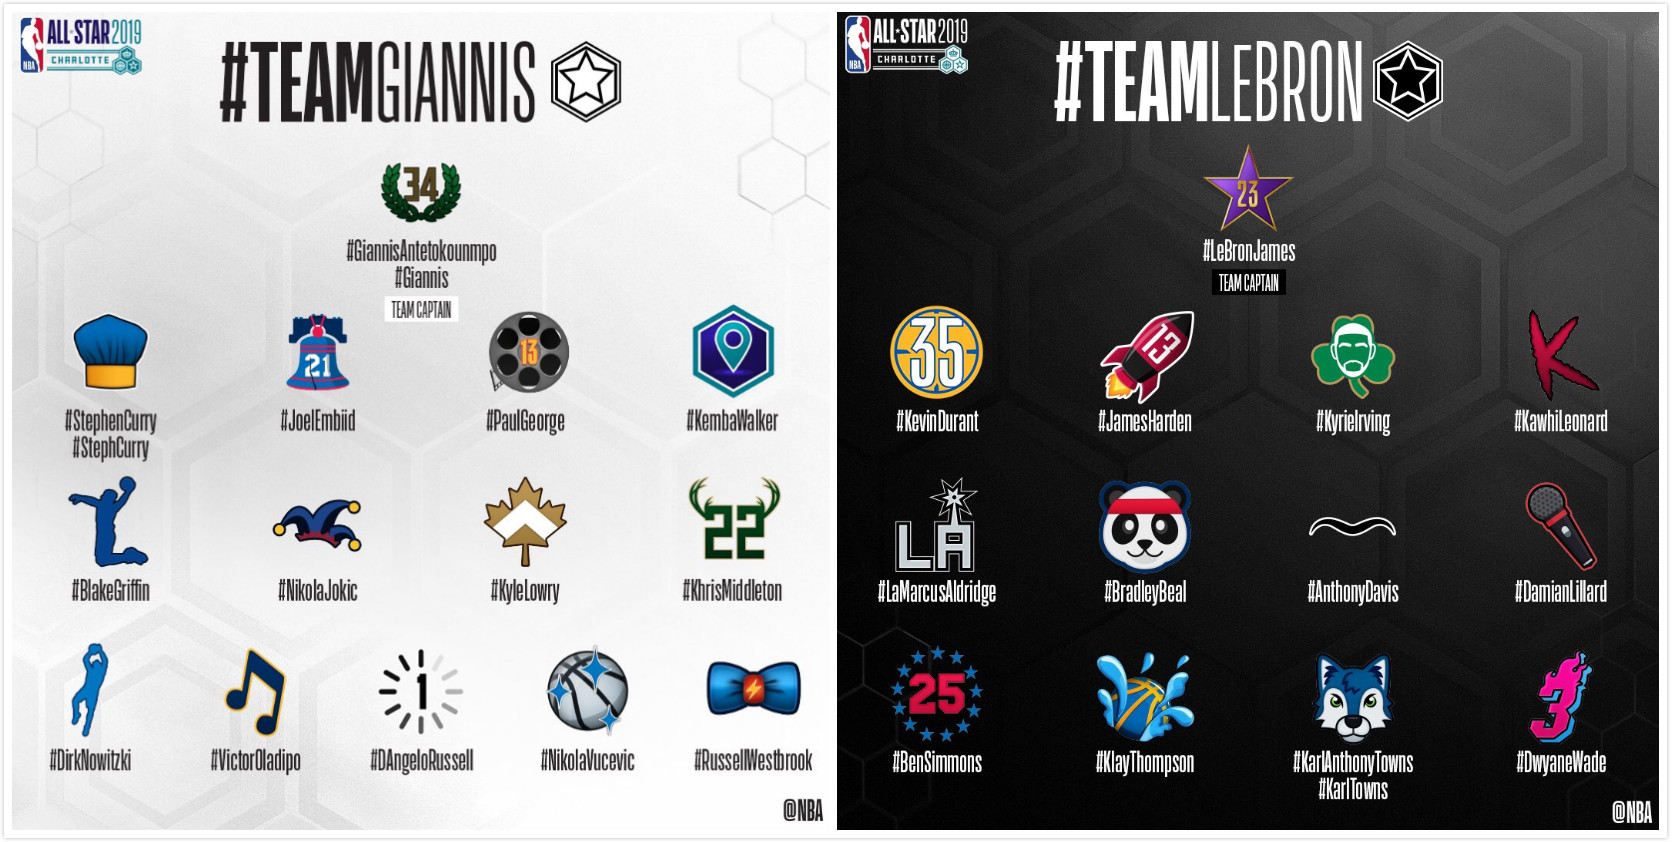 NBA官方发布各位全明星球员专属表情符号